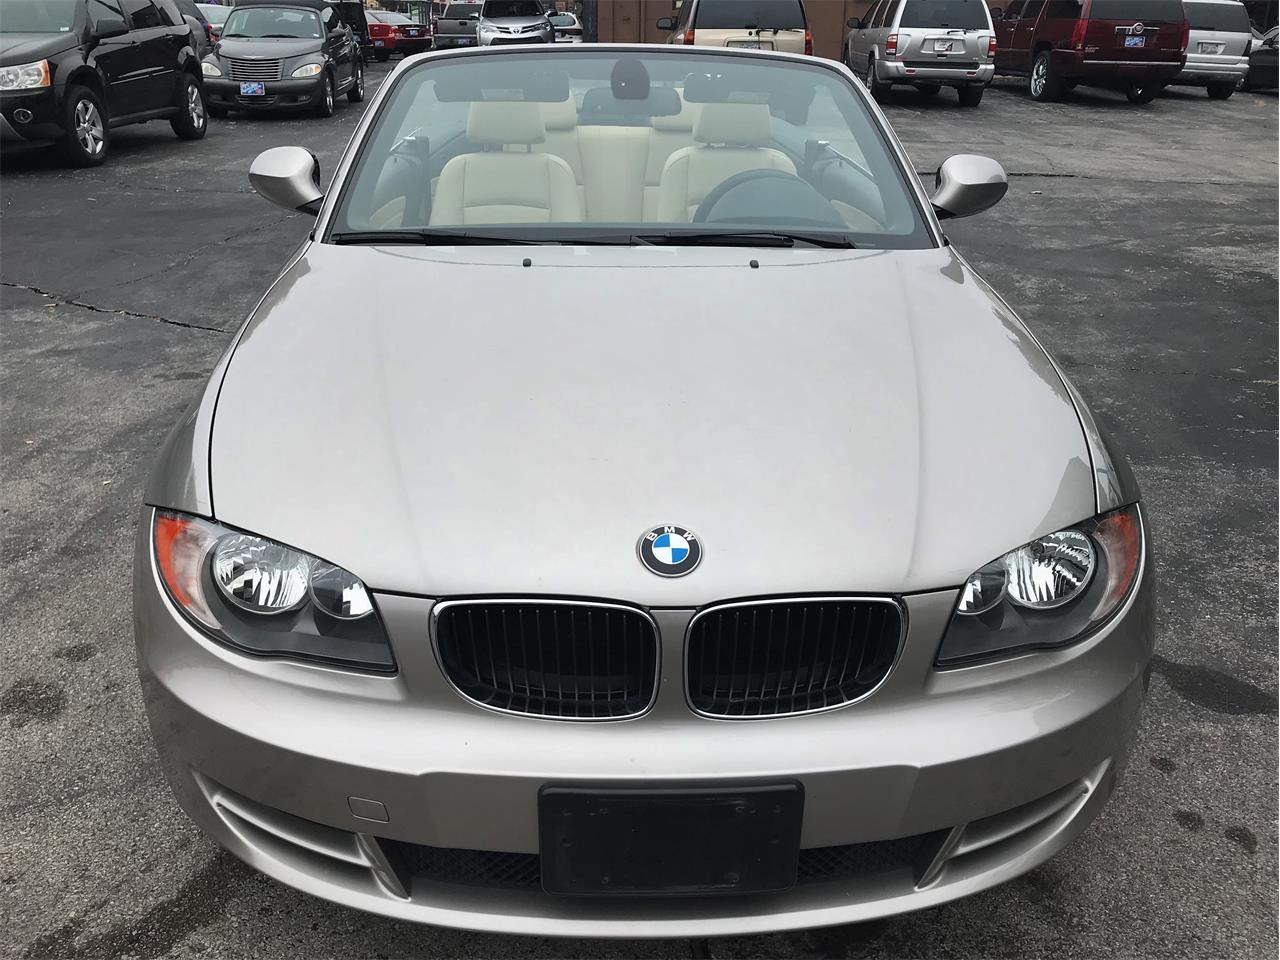 2010 BMW 128i (CC-1298524) for sale in Saint Louis, Missouri